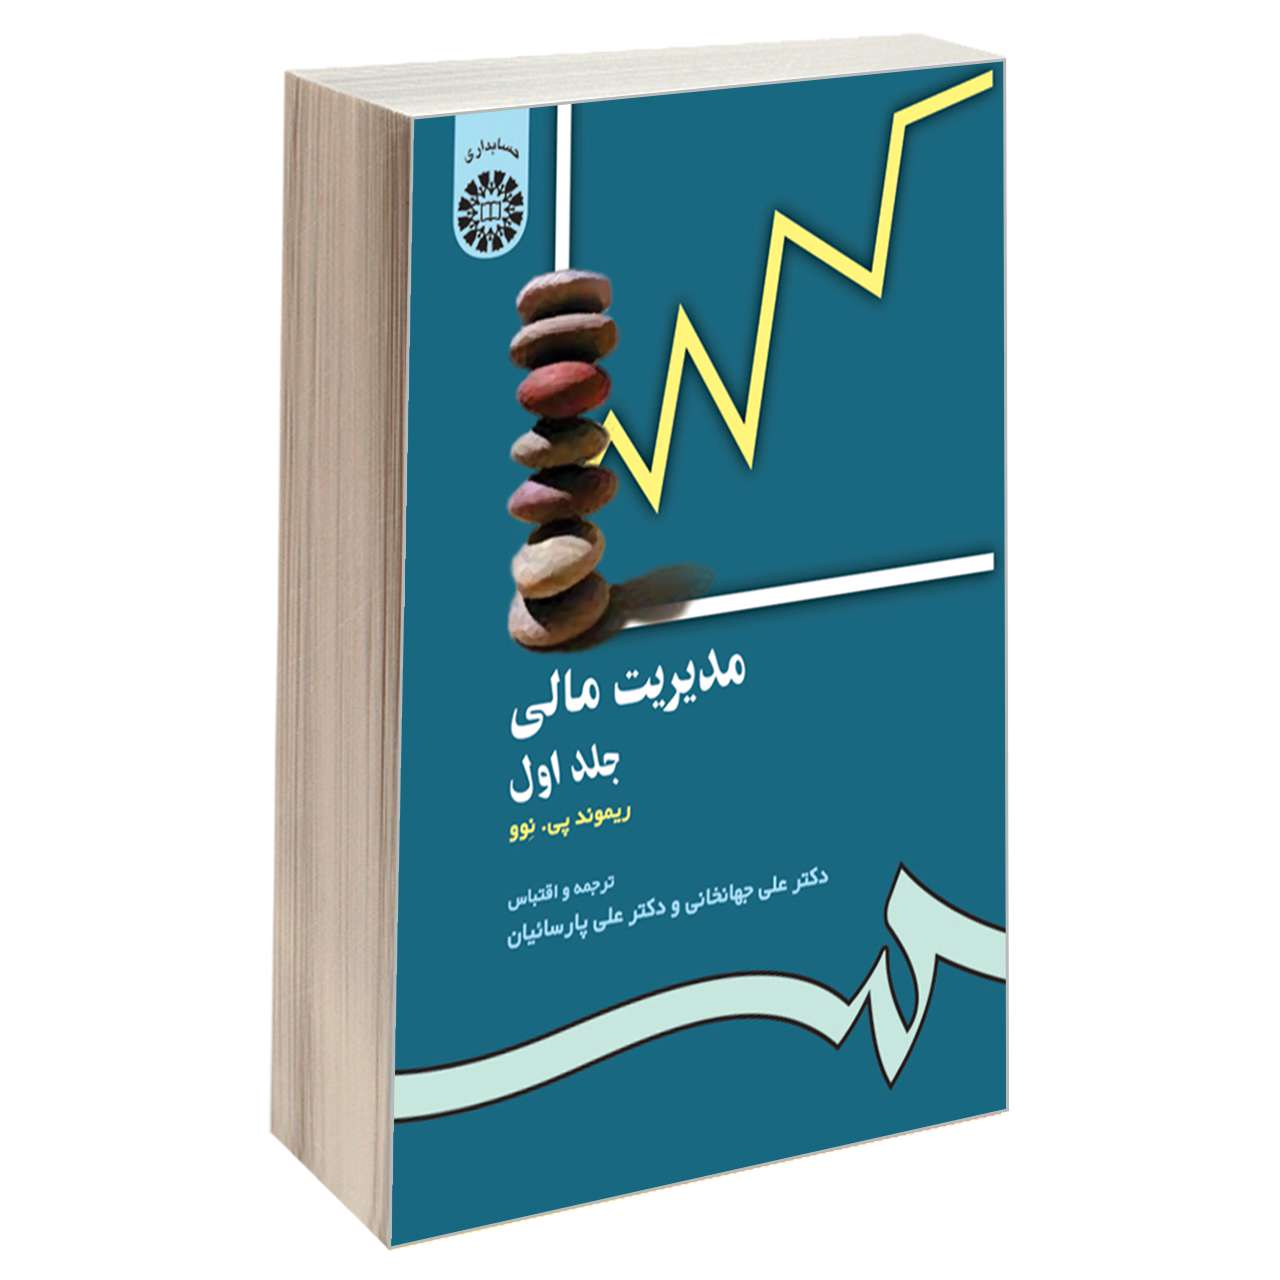 خرید                      کتاب مدیریت مالی اثر ریموند پی. نوو نشر سمت جلد 1